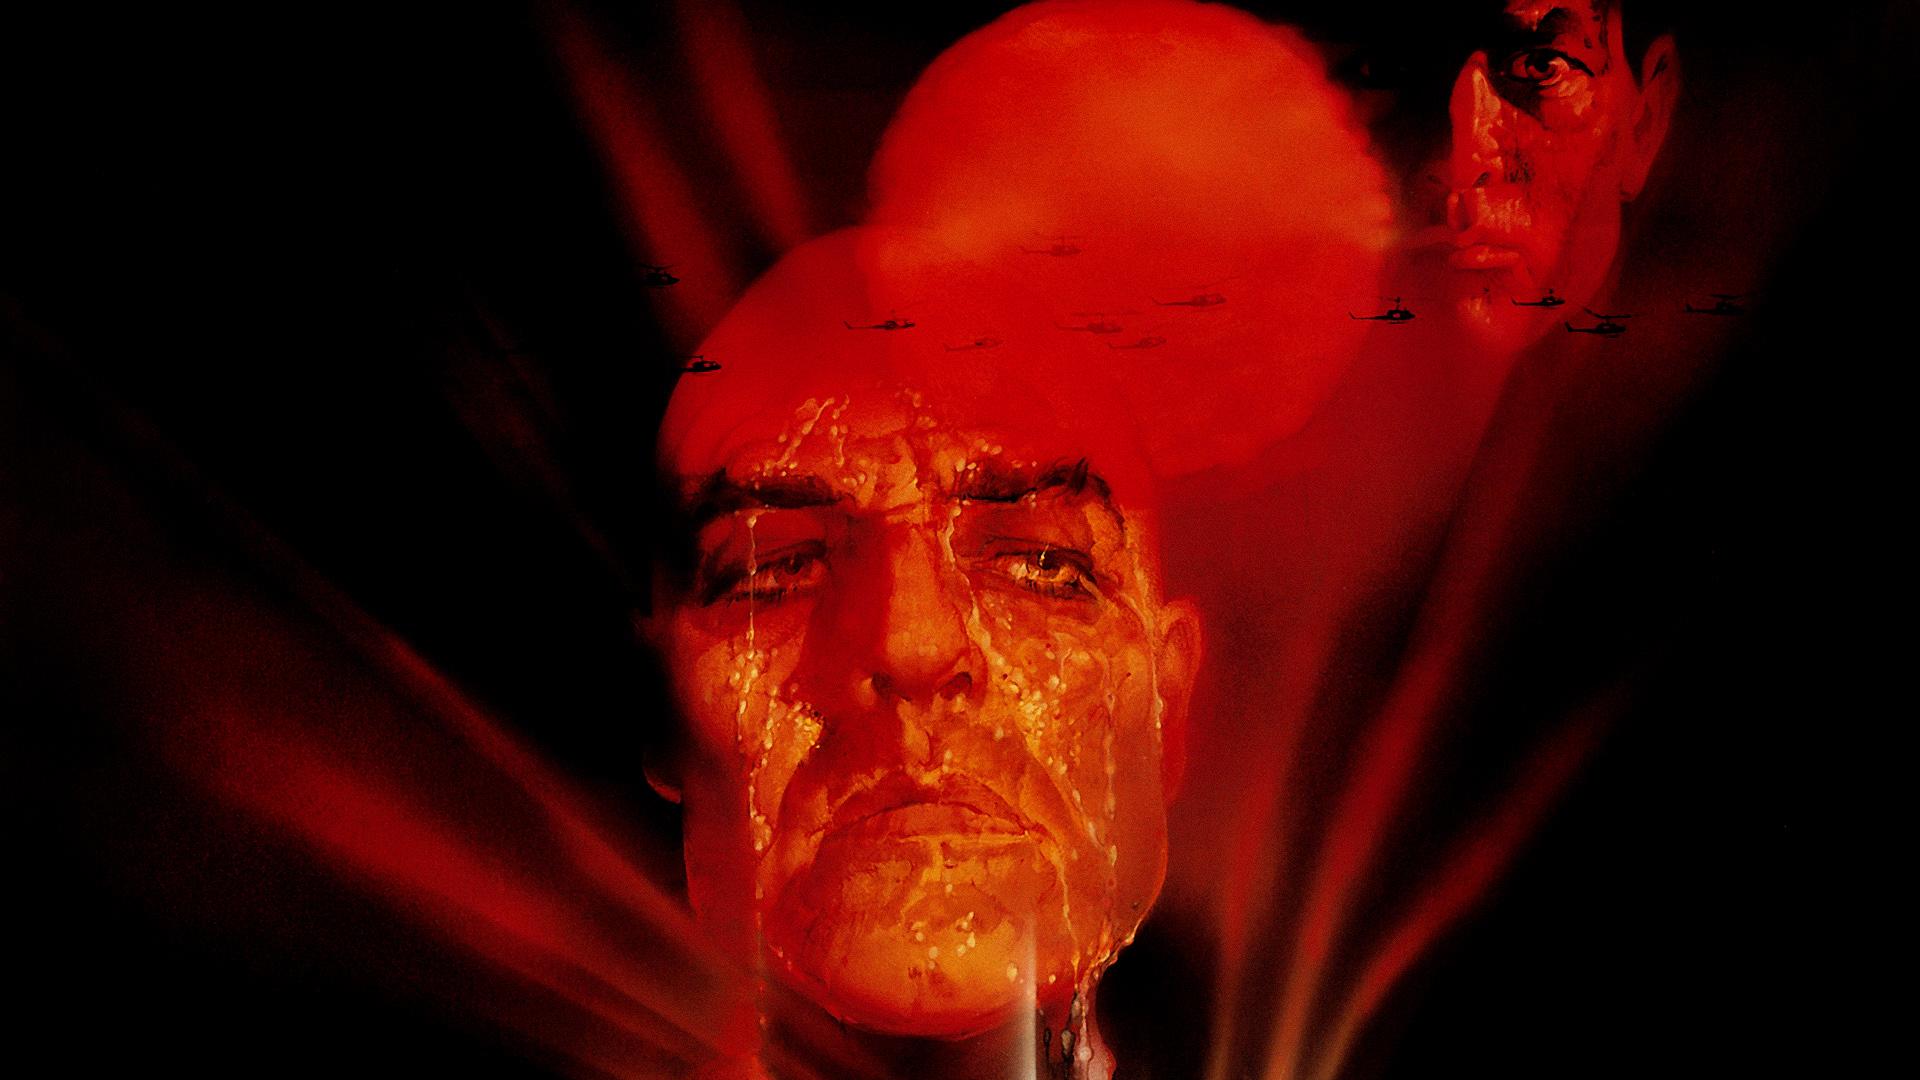 Apocalypse Now HD Wallpaper | Sfondo | 1920x1080 | ID:785946 - Wallpaper  Abyss